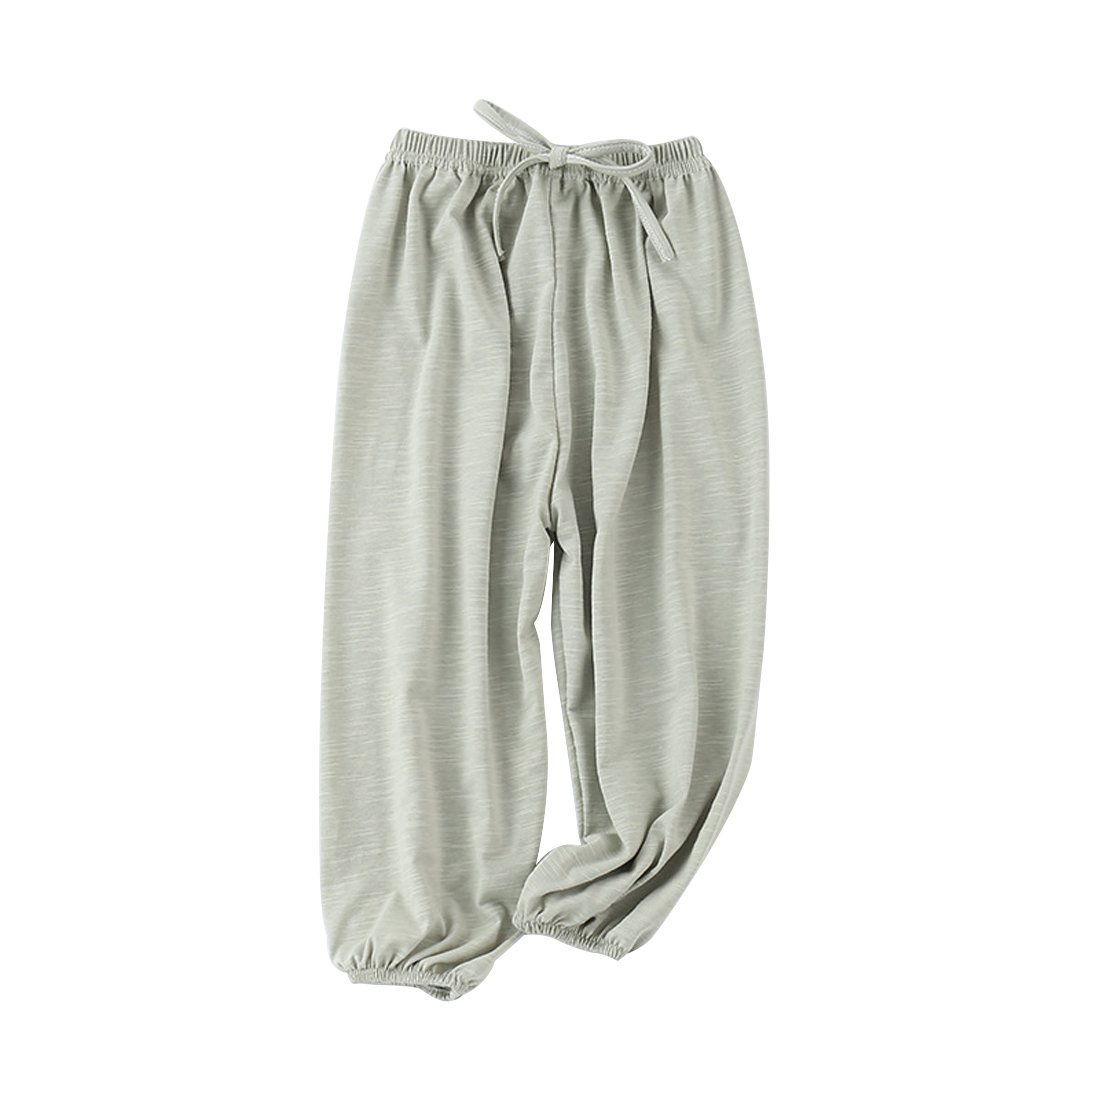 PAUBOLI Baby Long Bloomers Soft Slub Cotton Harem Pants Boys Girls 12M-7T